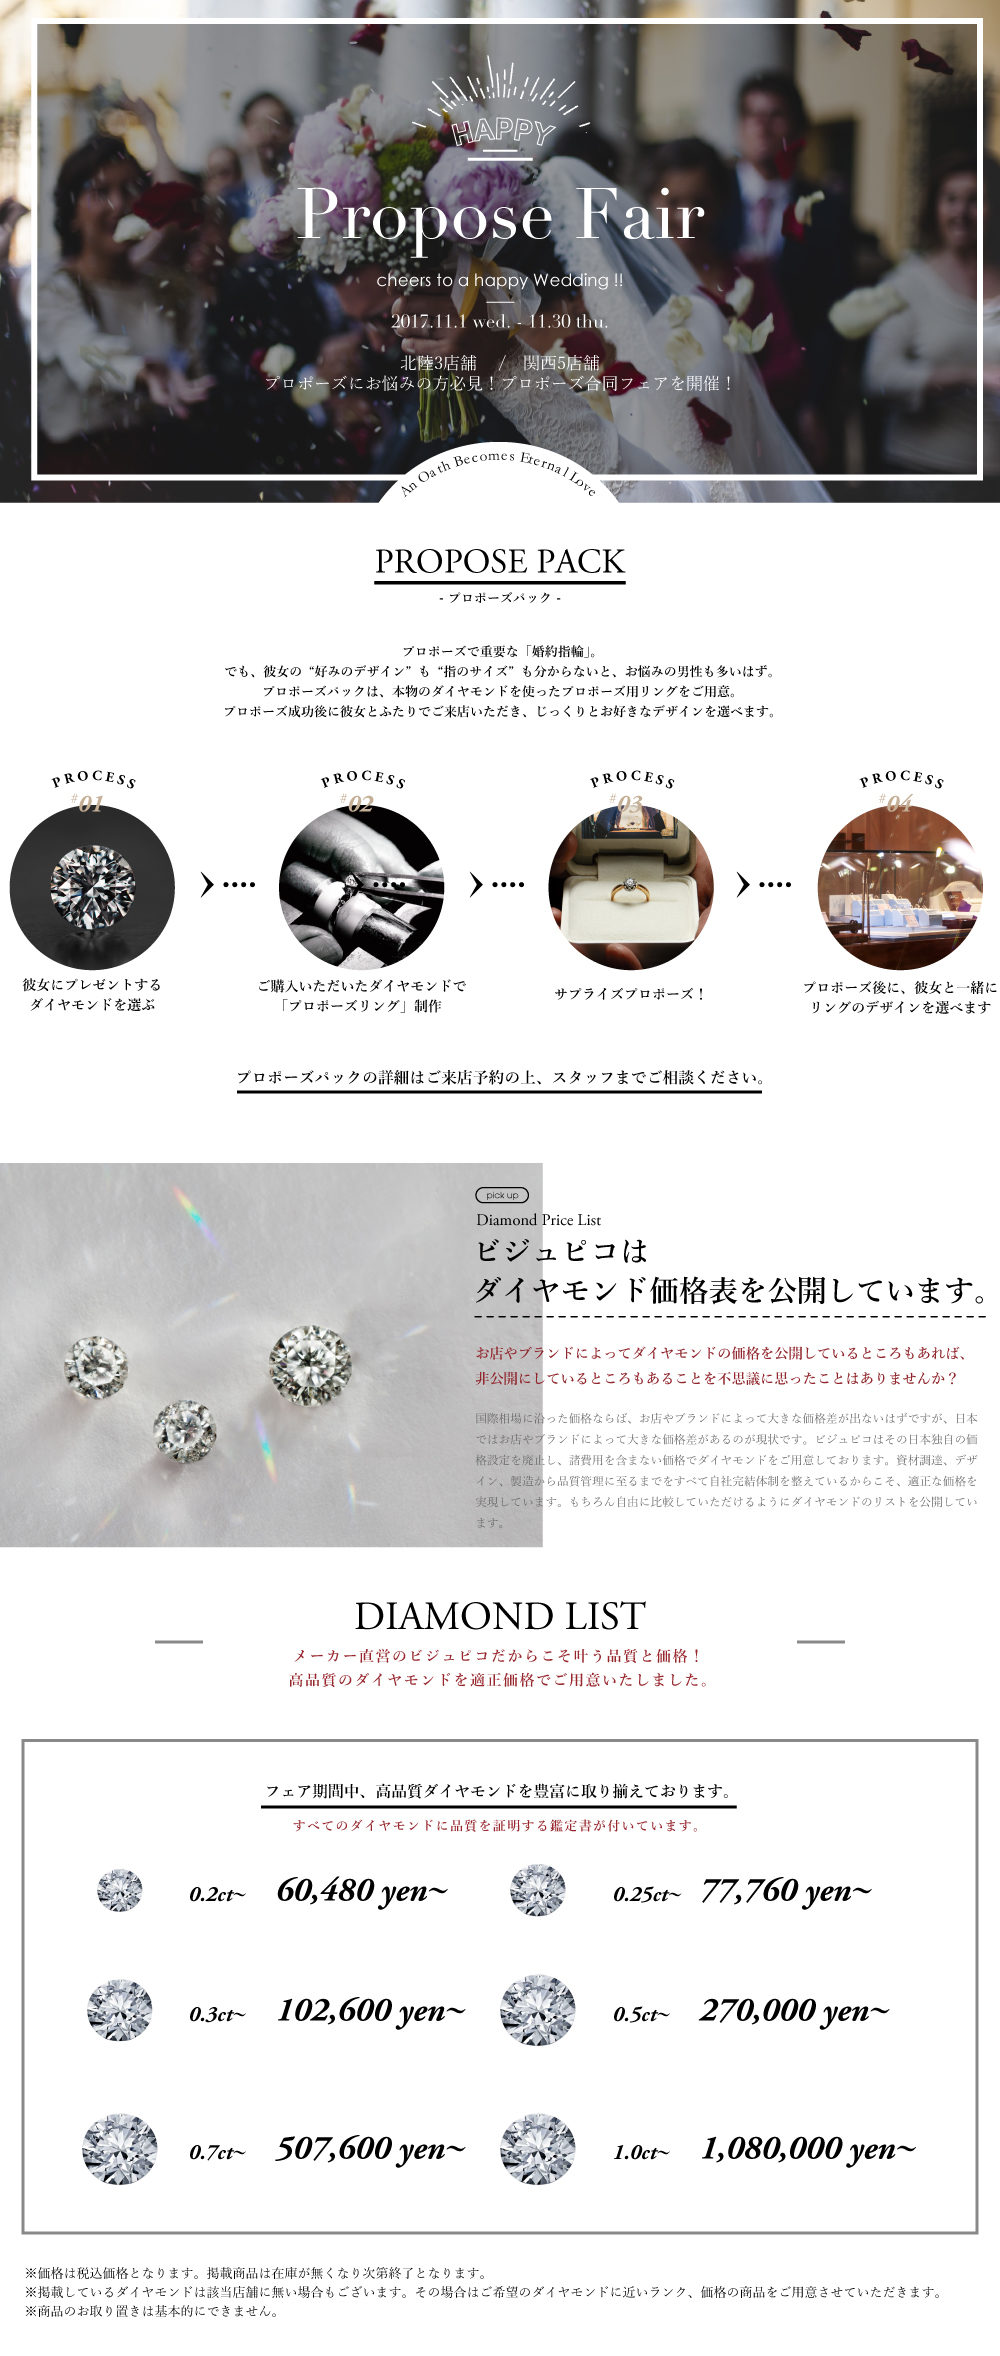 171109_kanazawa_kansai_shopshosai_fiar